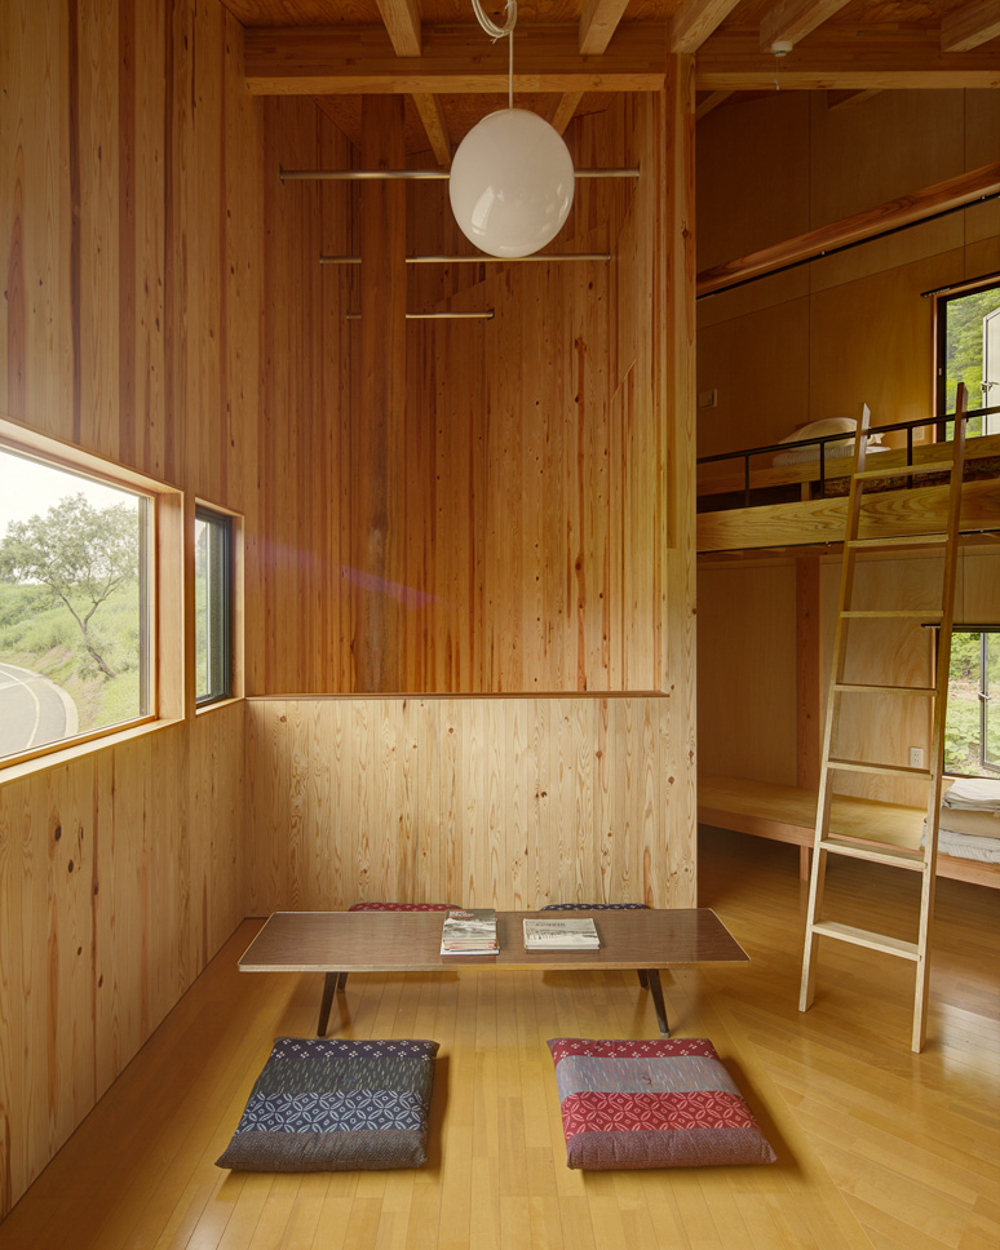 australia-house-andrew-burns-architecture-the-design-emotive-12.jpg